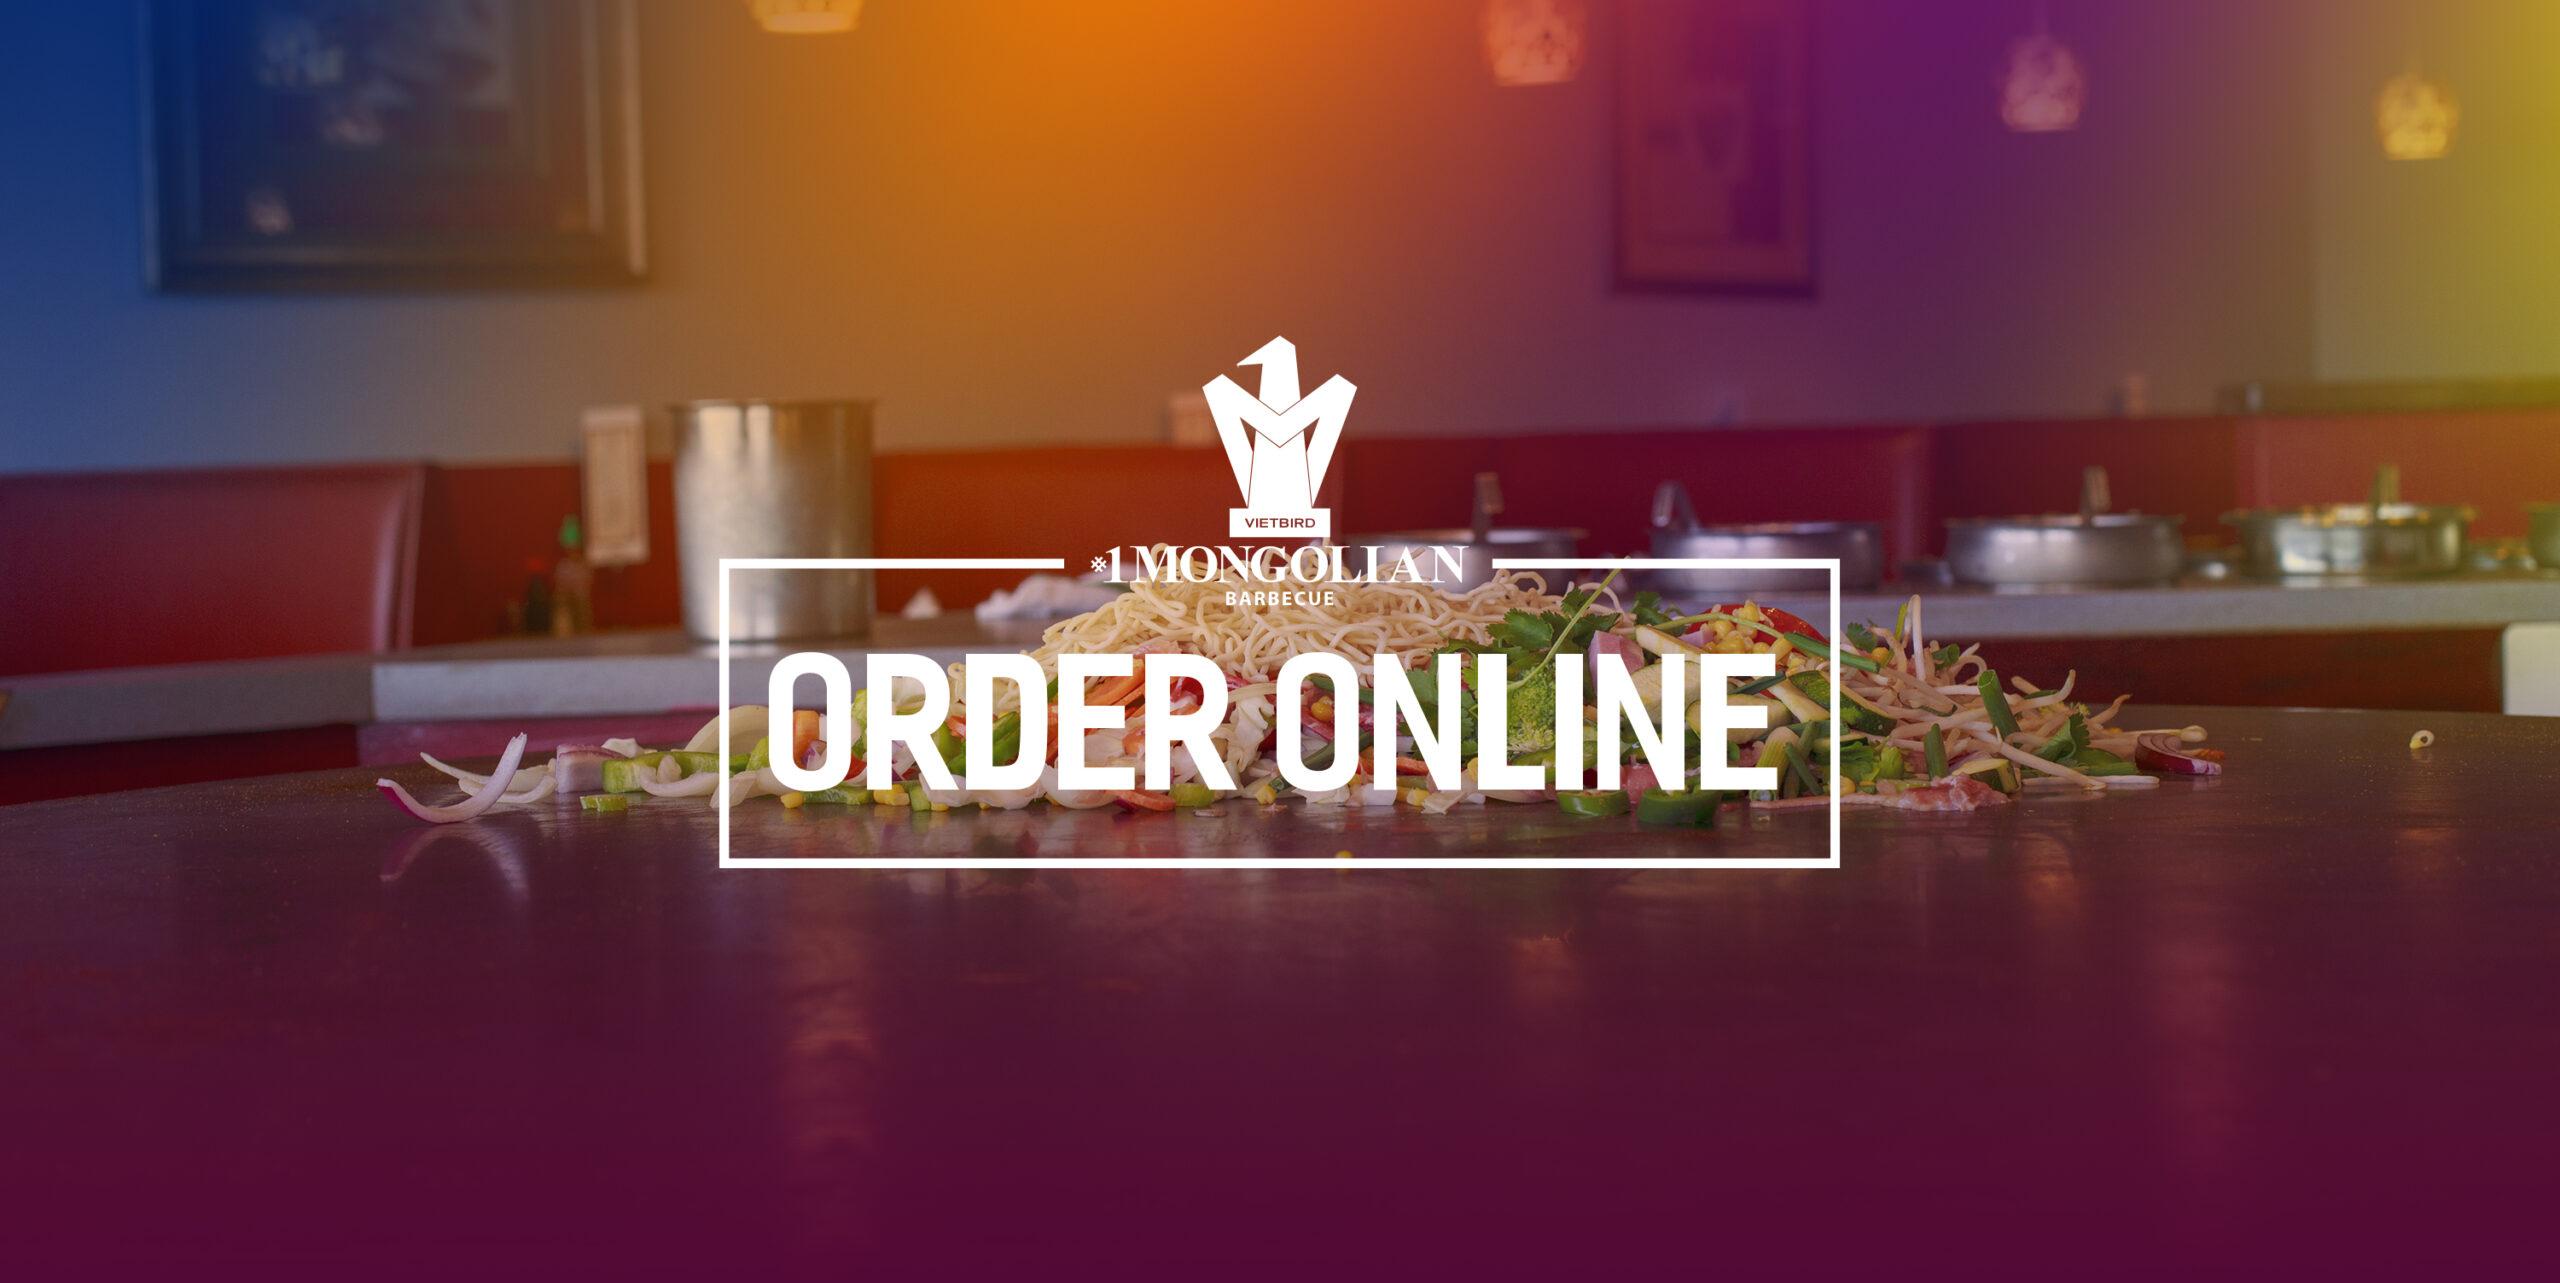 1MongolianBBQ_banner2021_ORDER ONLINE